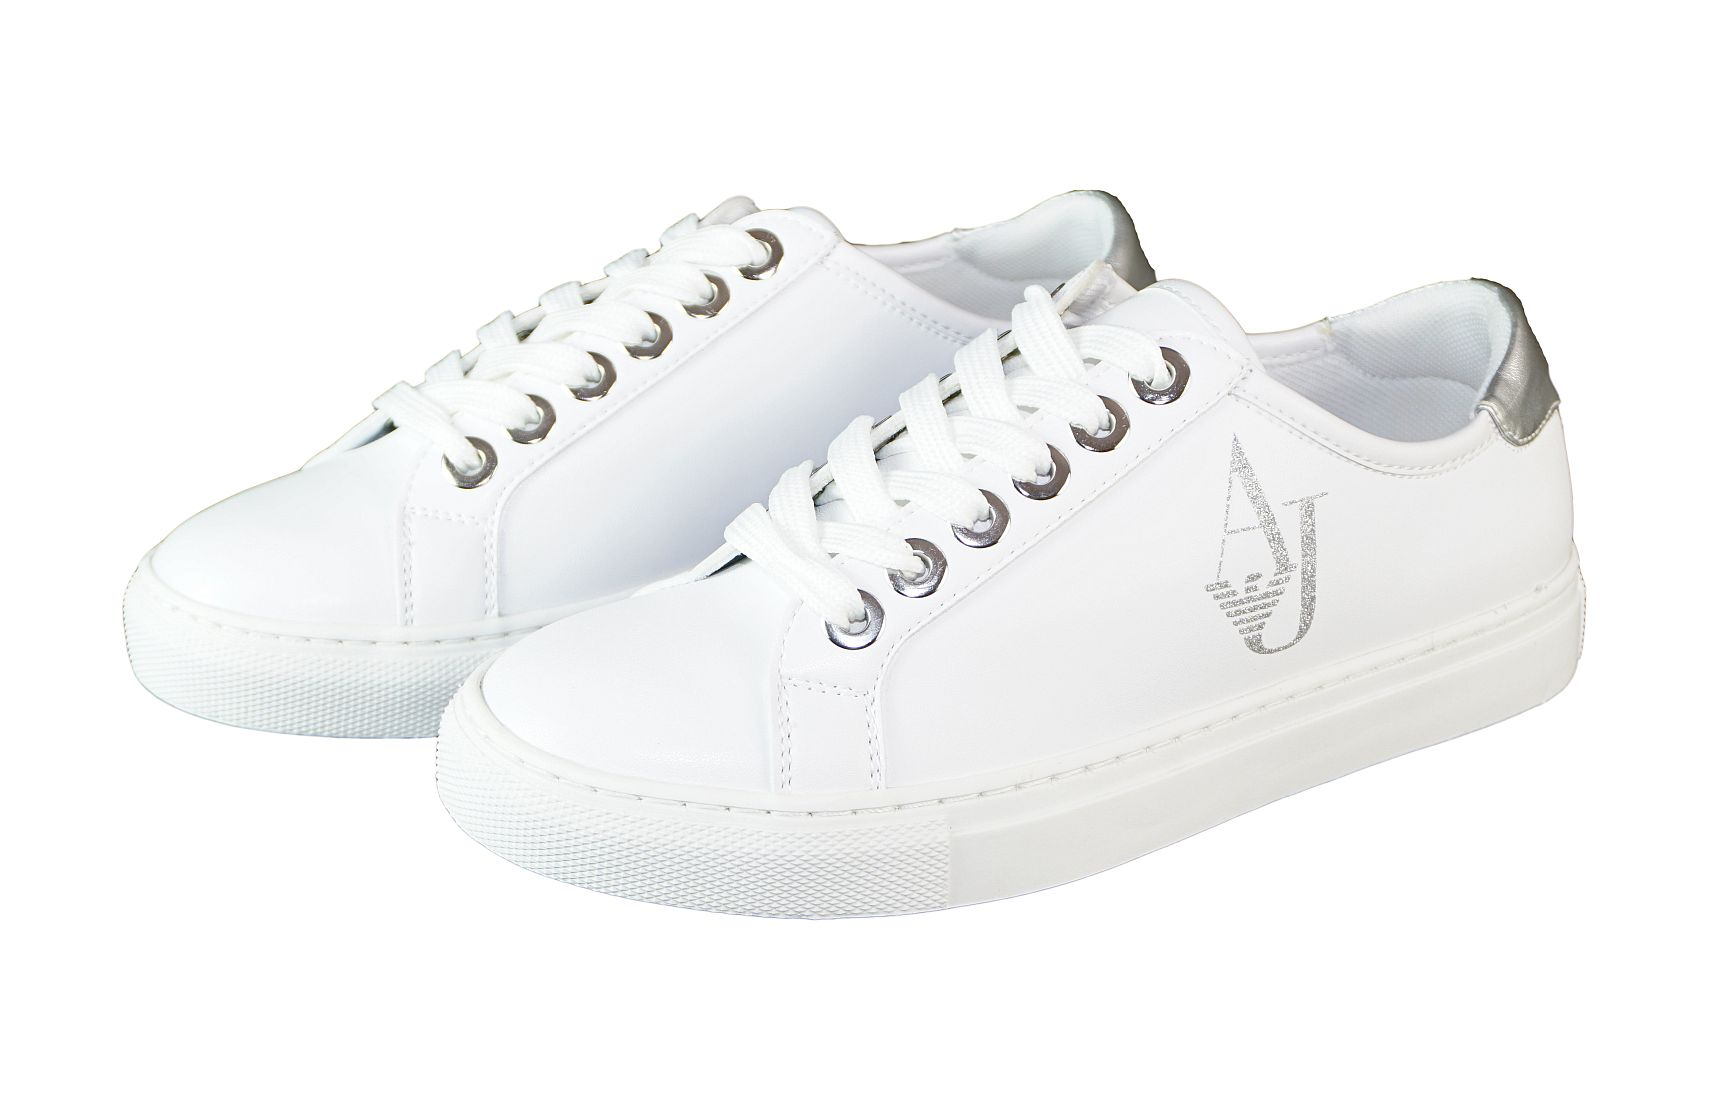 Armani Jeans Schnürschuhe SNEAKER ARMANINA 925220 7P610 00010 Bianco weiss S17-AJS1